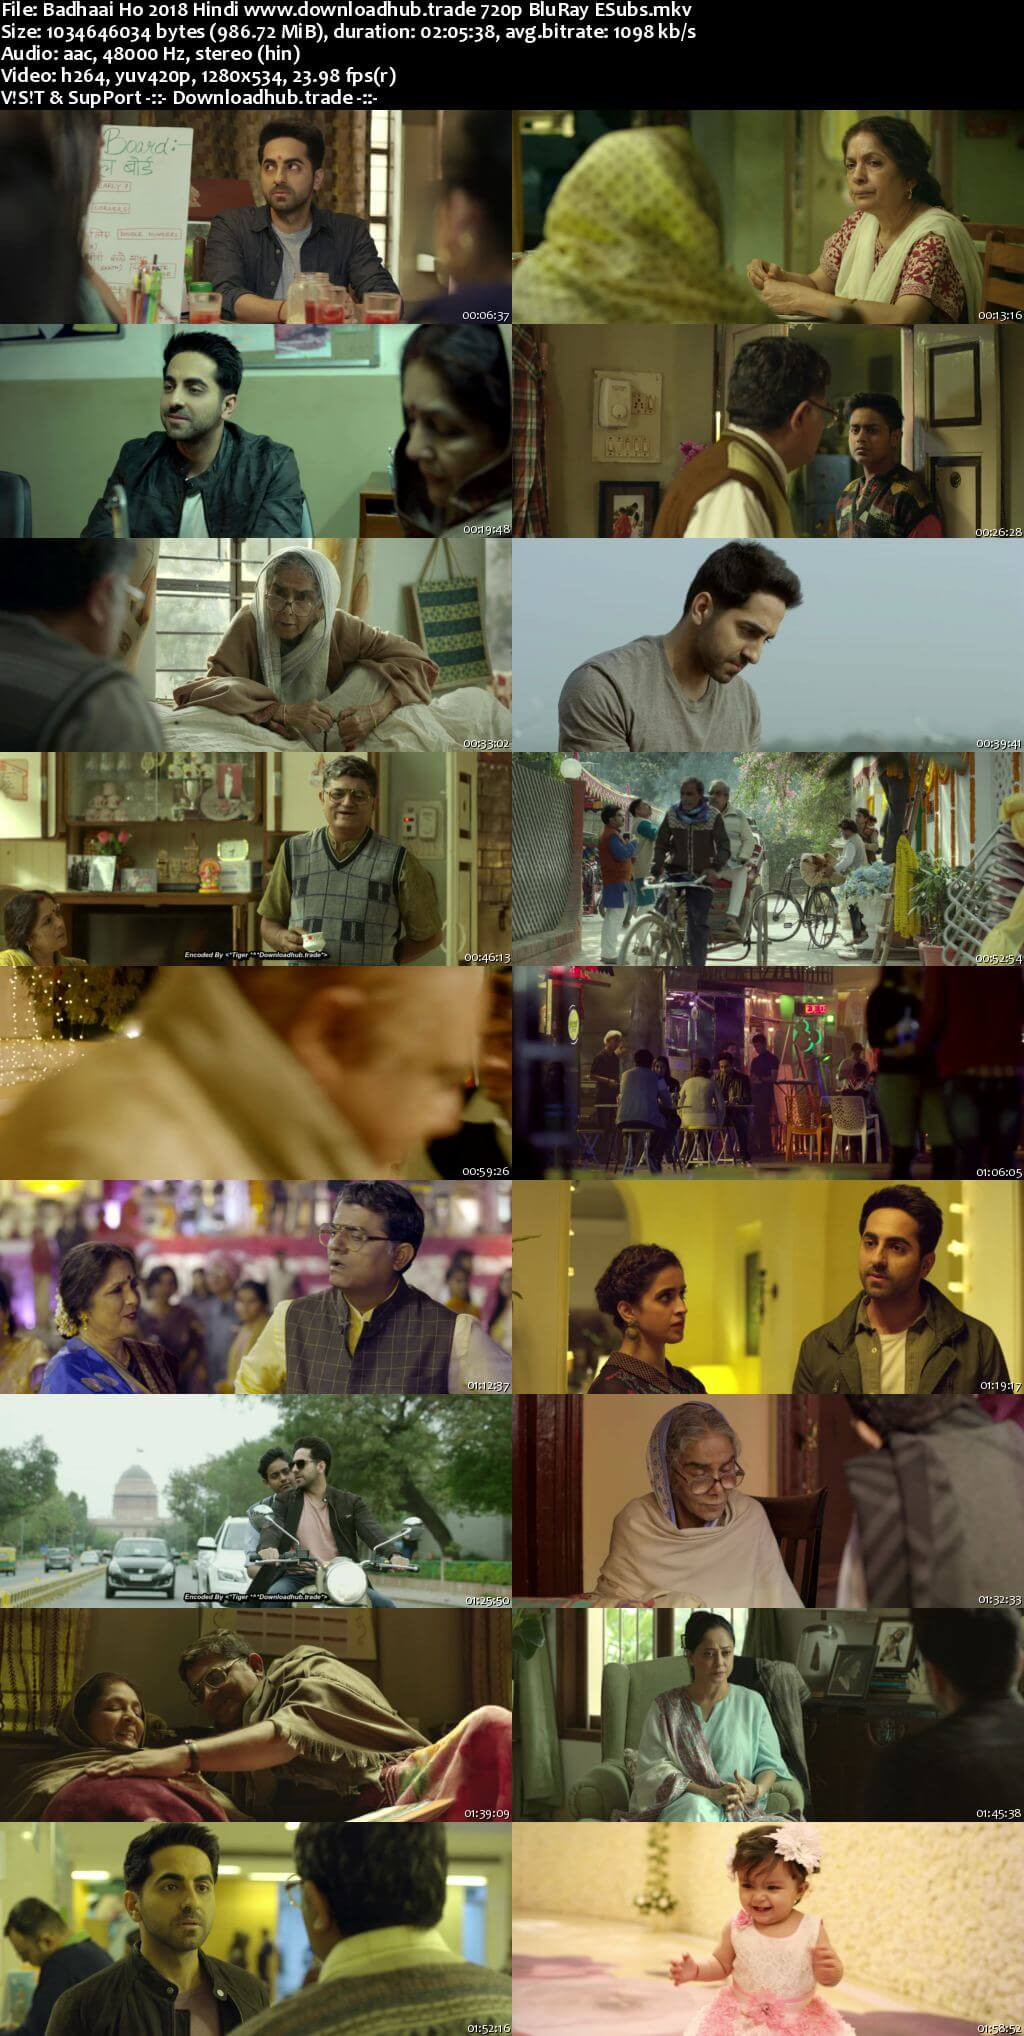 Badhaai Ho 2018 Hindi 720p BluRay ESubs